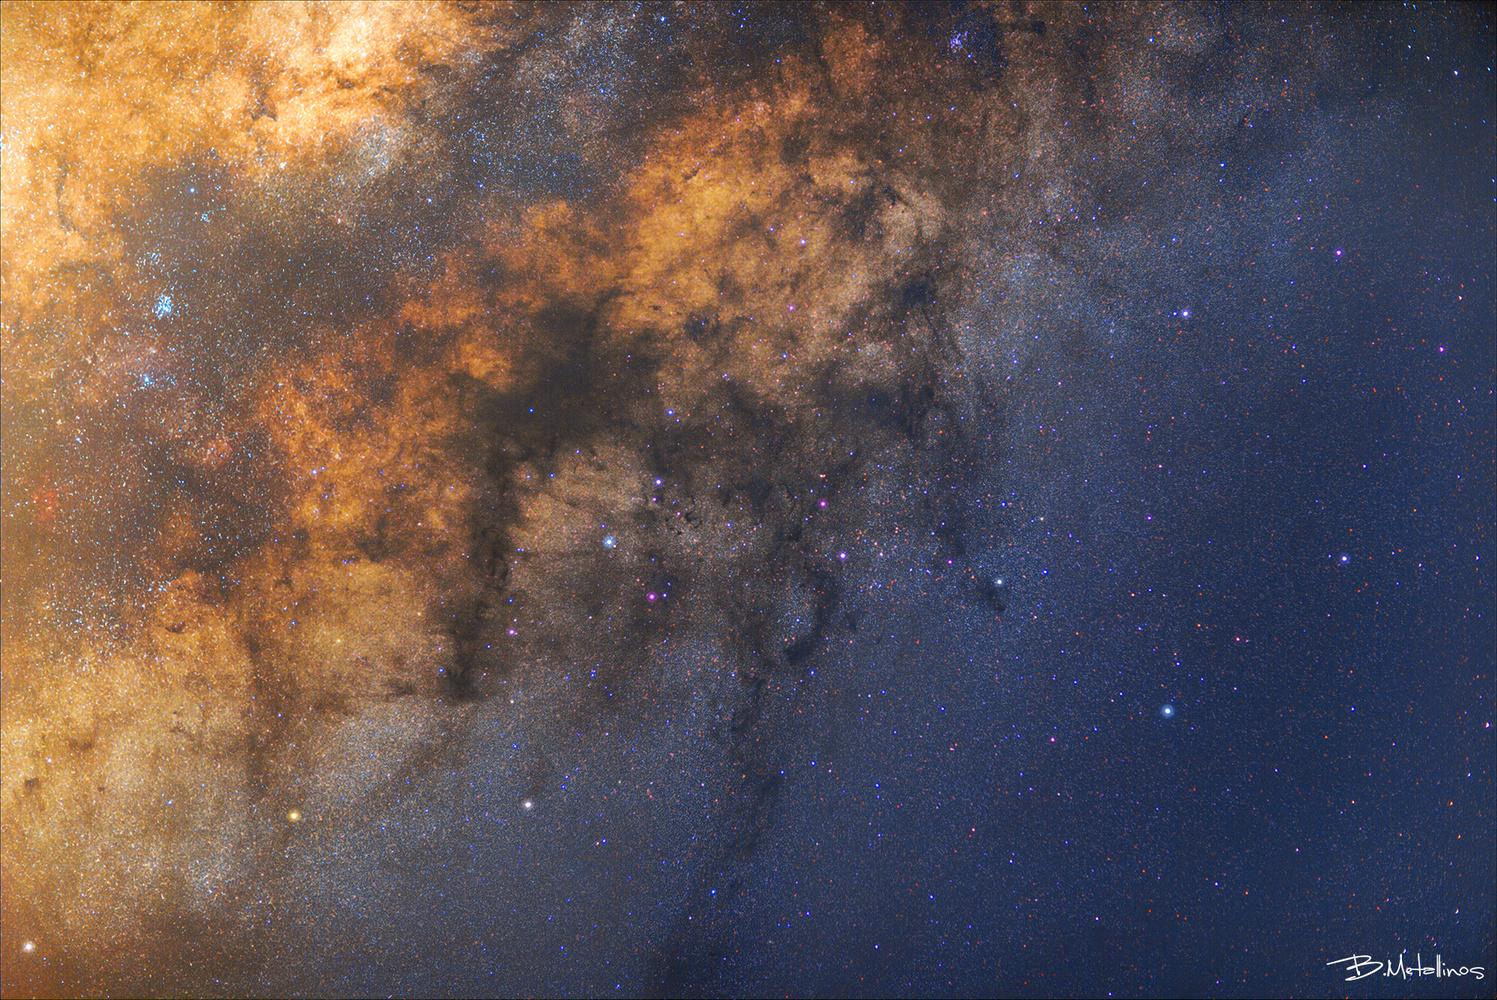 Cosmic Horse by Bill Metallinos